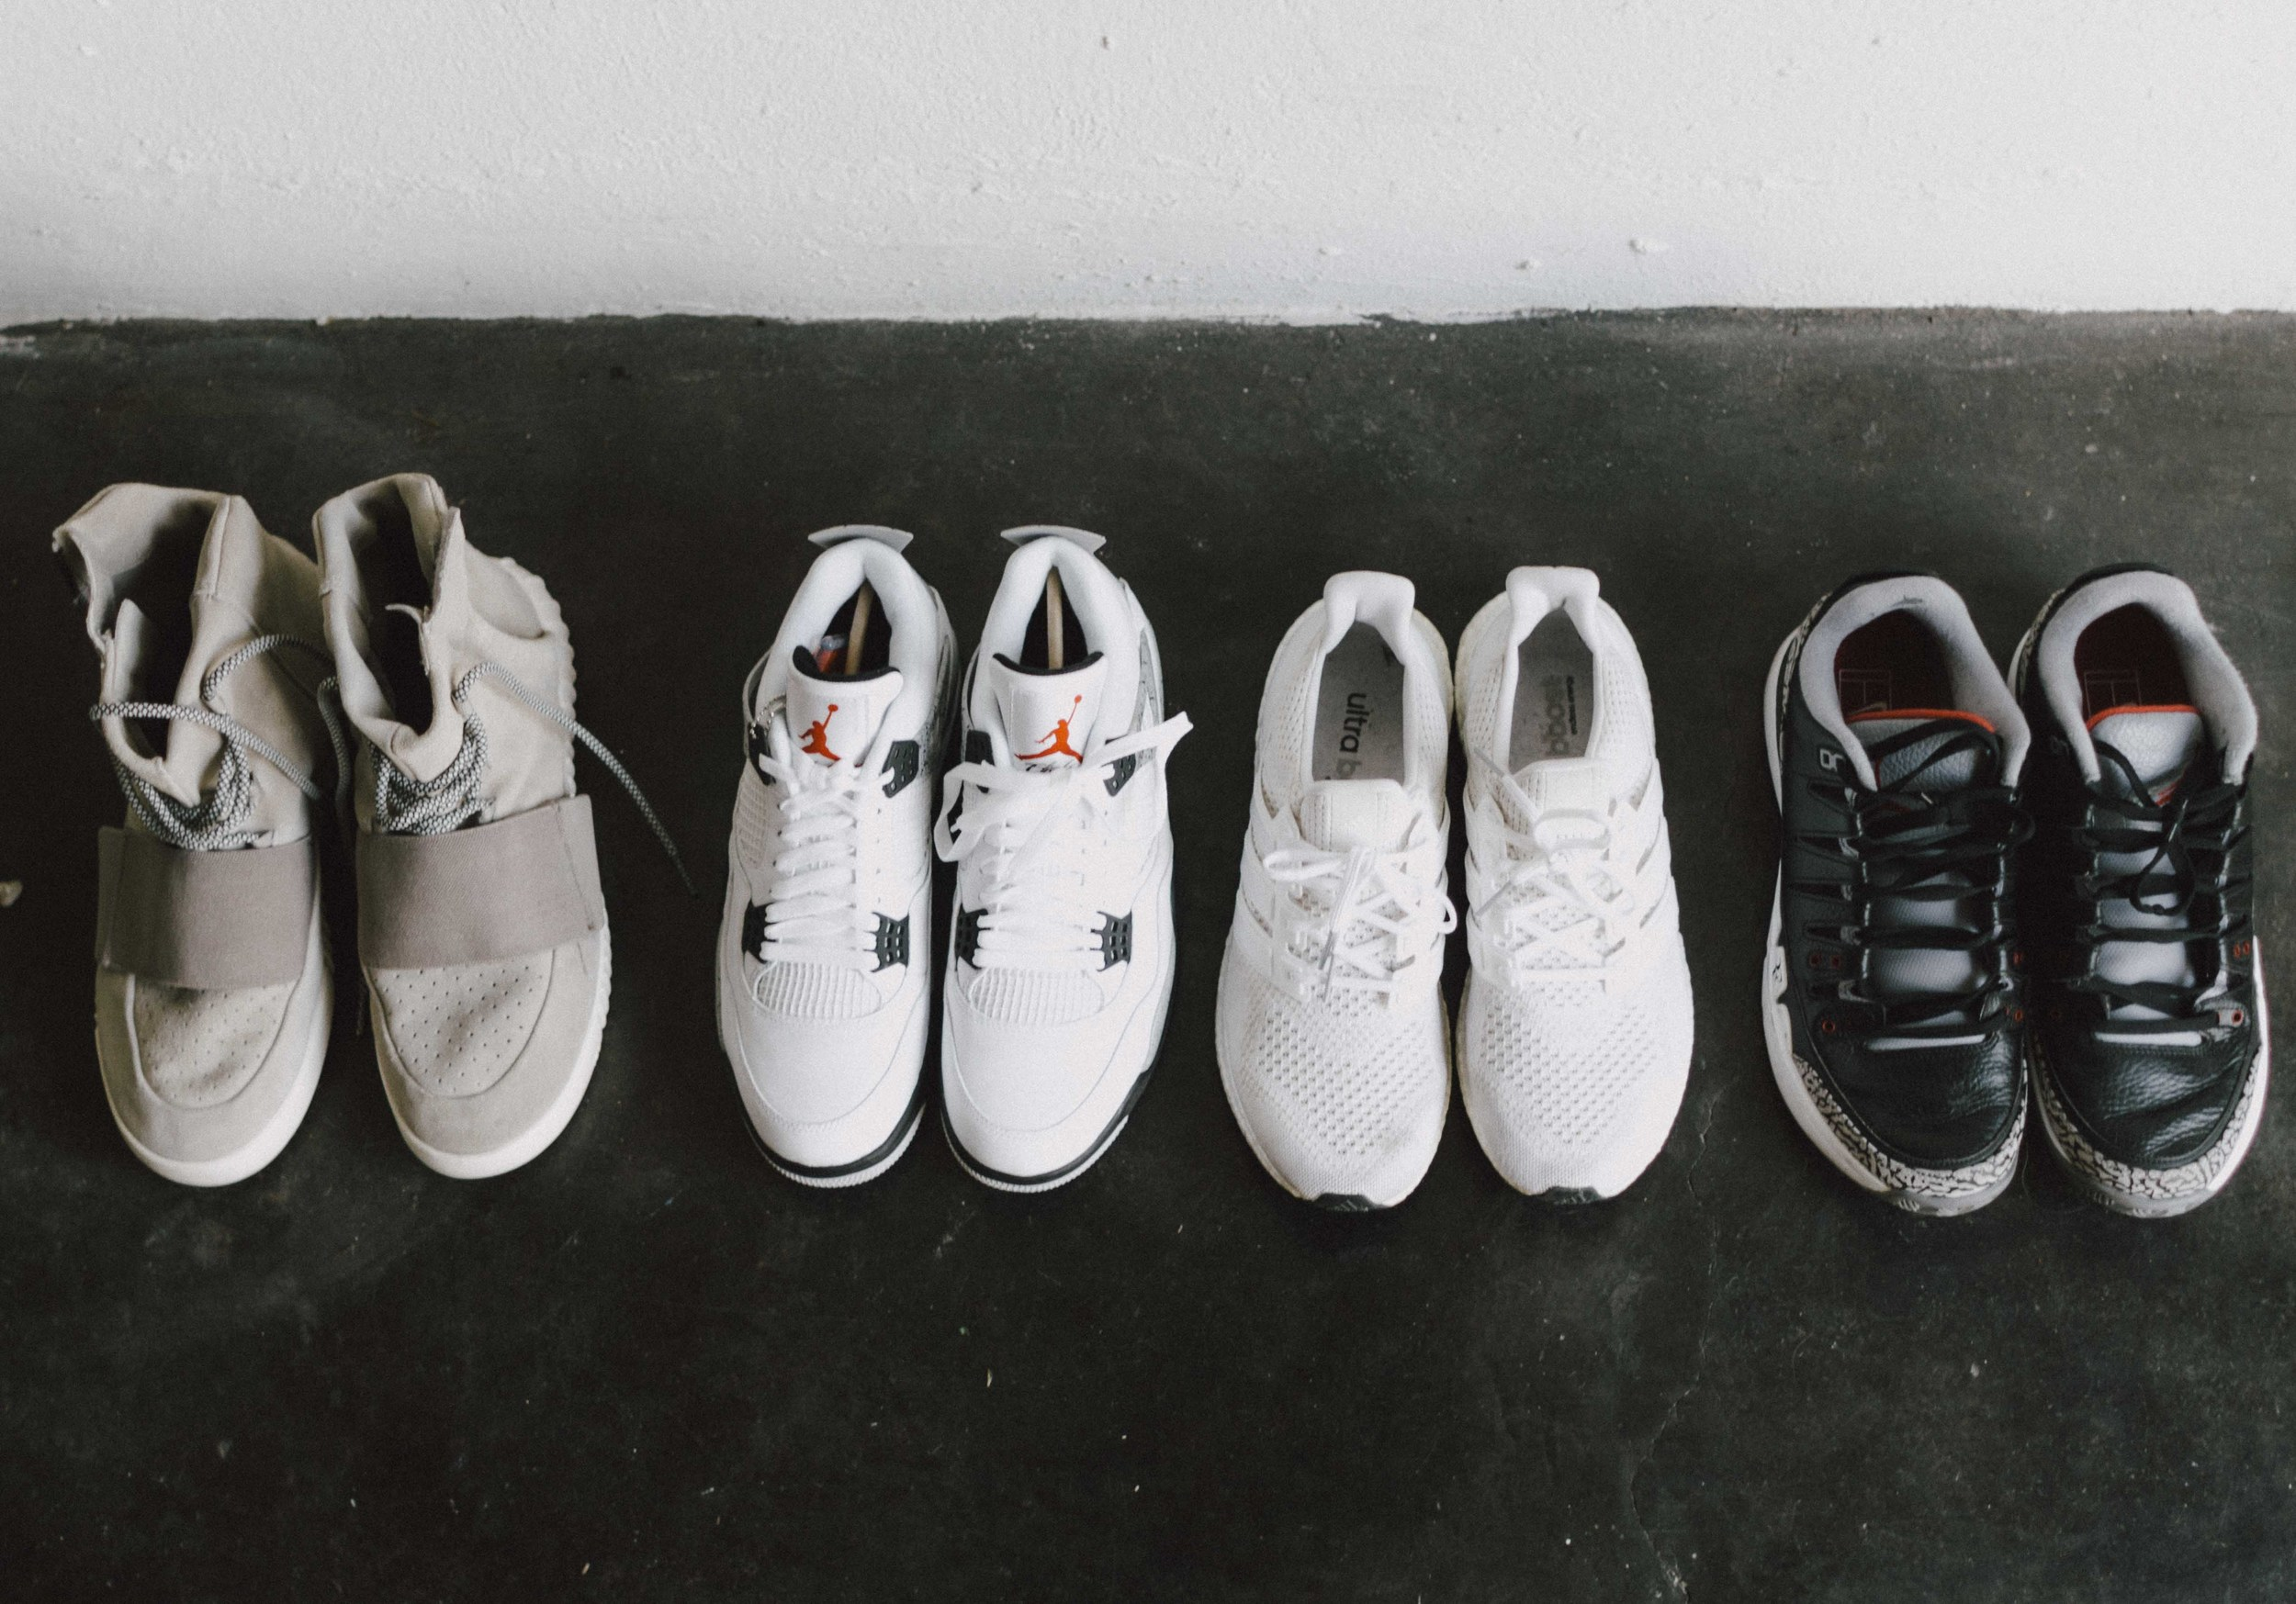 "Nike AJ3 RF Vapor Zoom Black Cement,  adidas Ultra Boost ""Triple White"",  adidas Yeezy Boost 750,  Air Jordan IV White Cement"